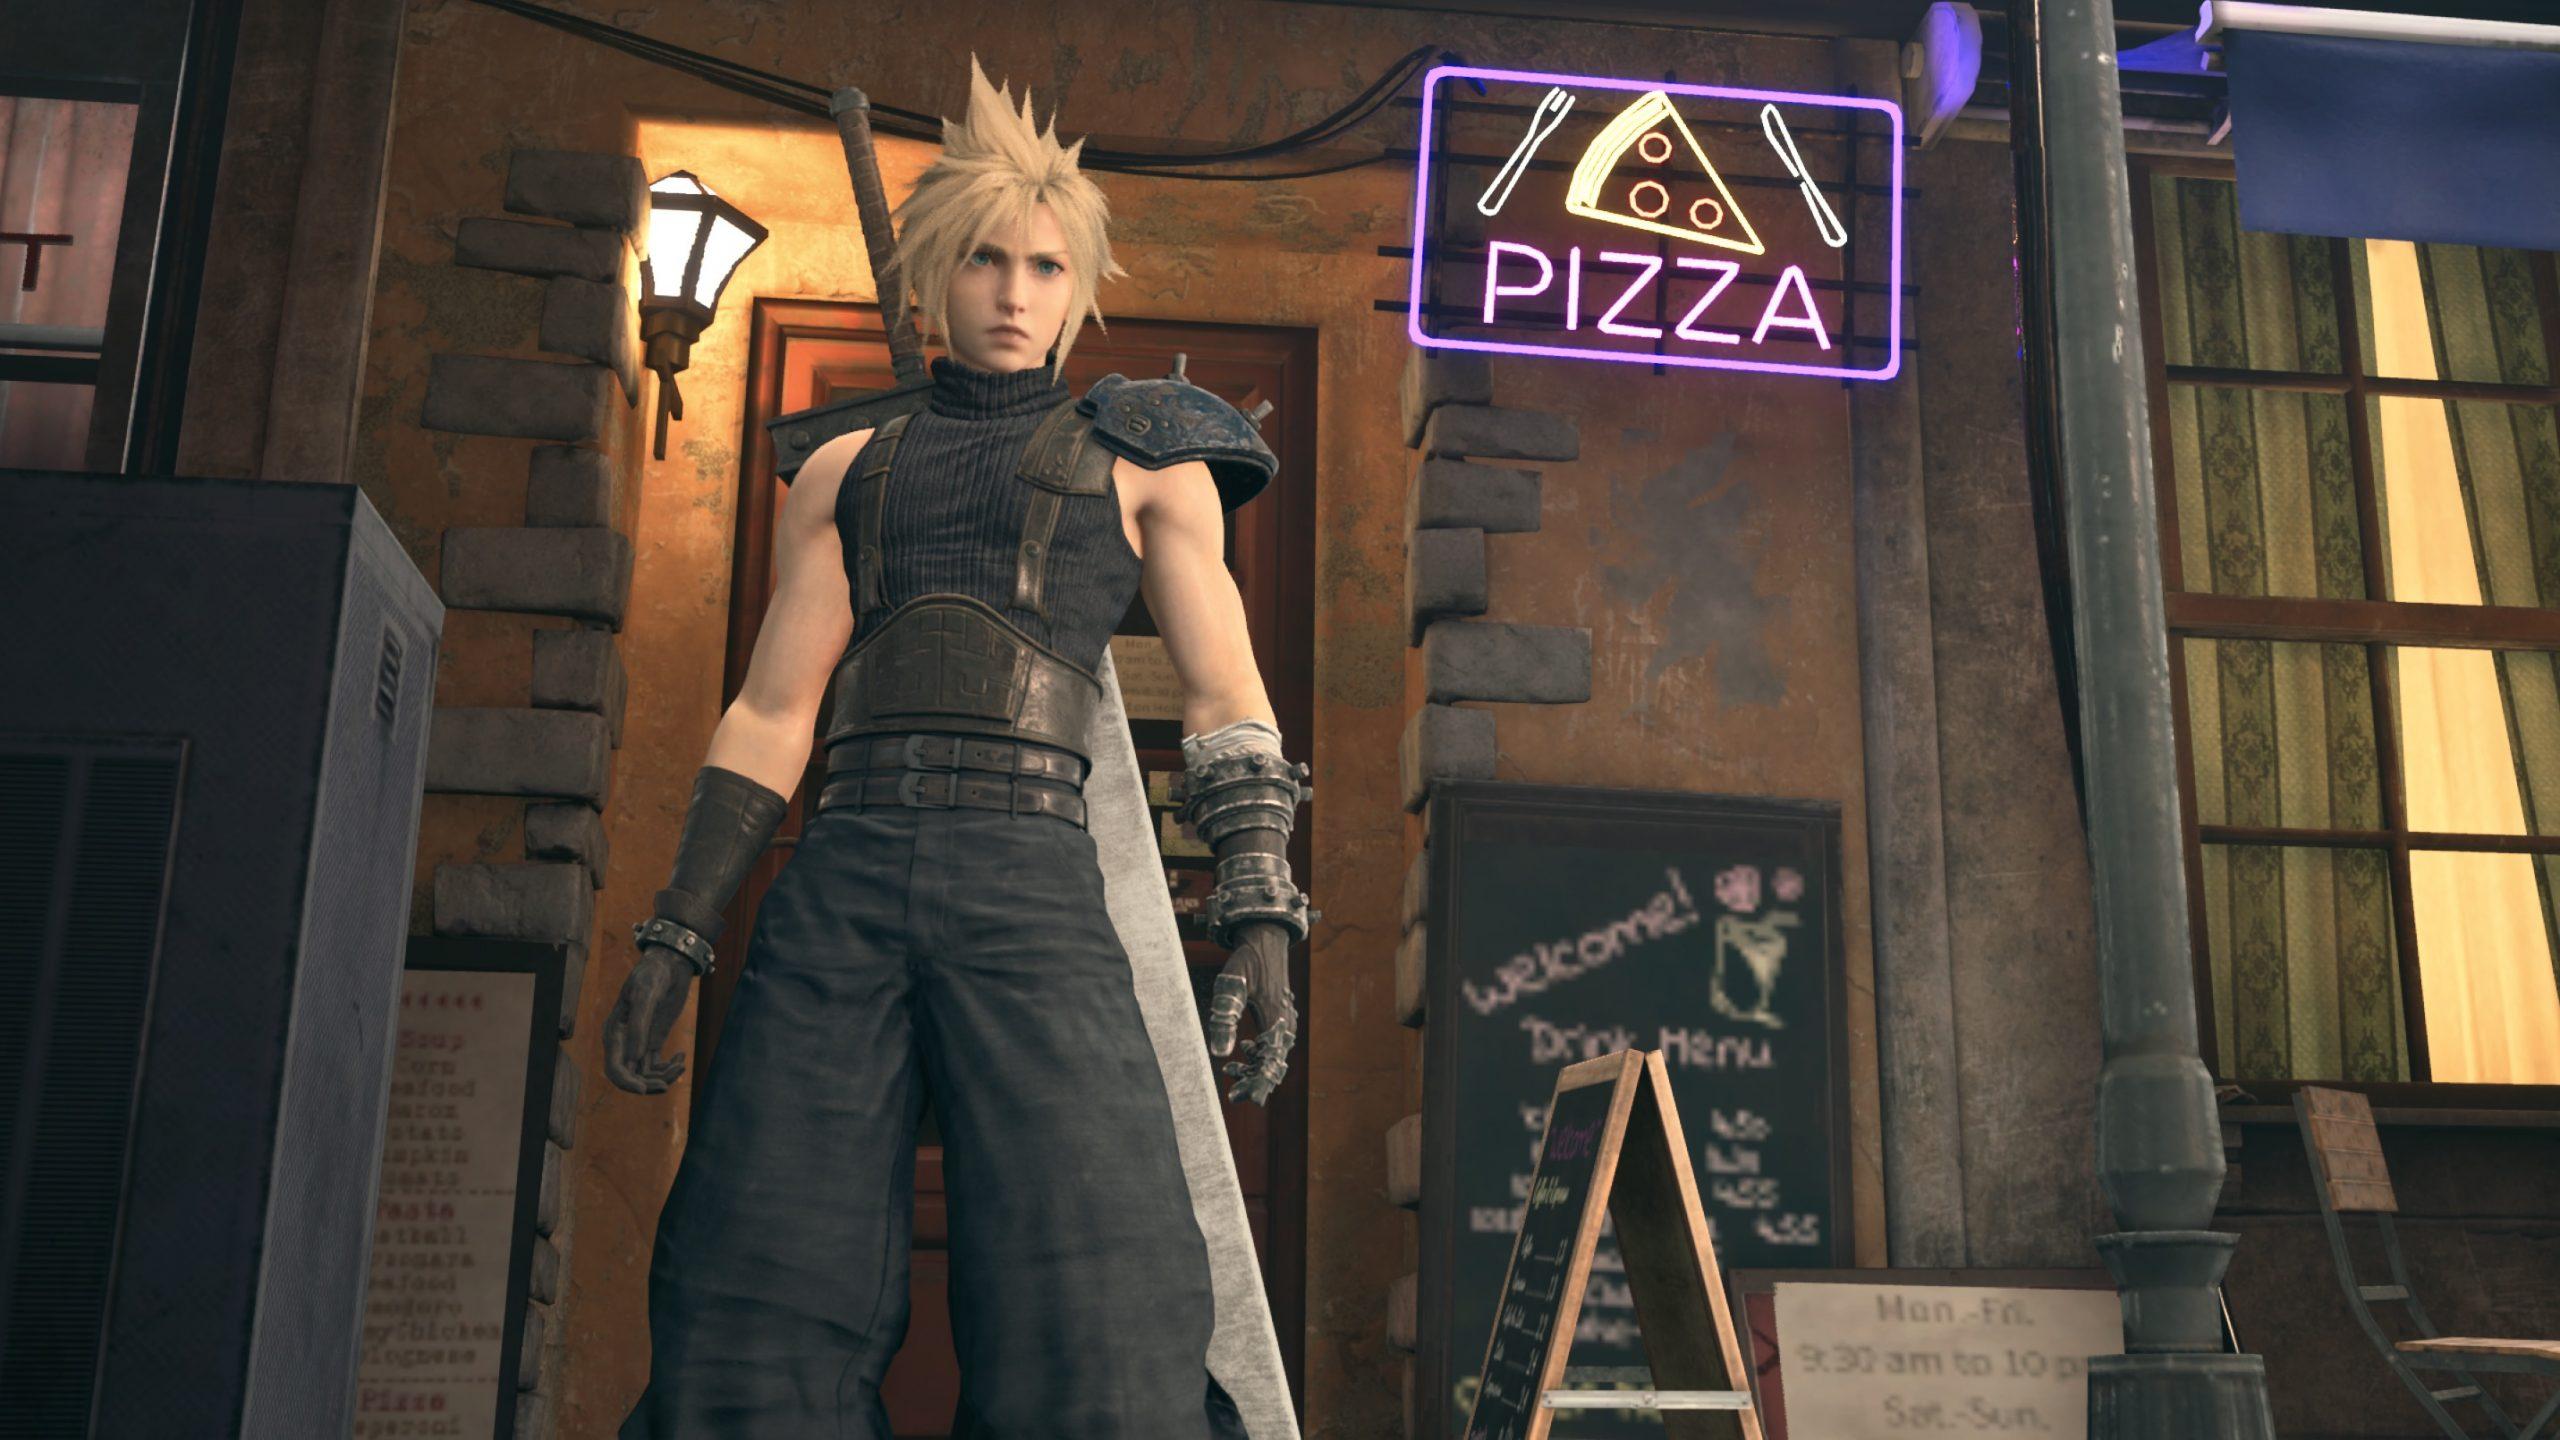 La Pizza in Final Fantasy VII Remake